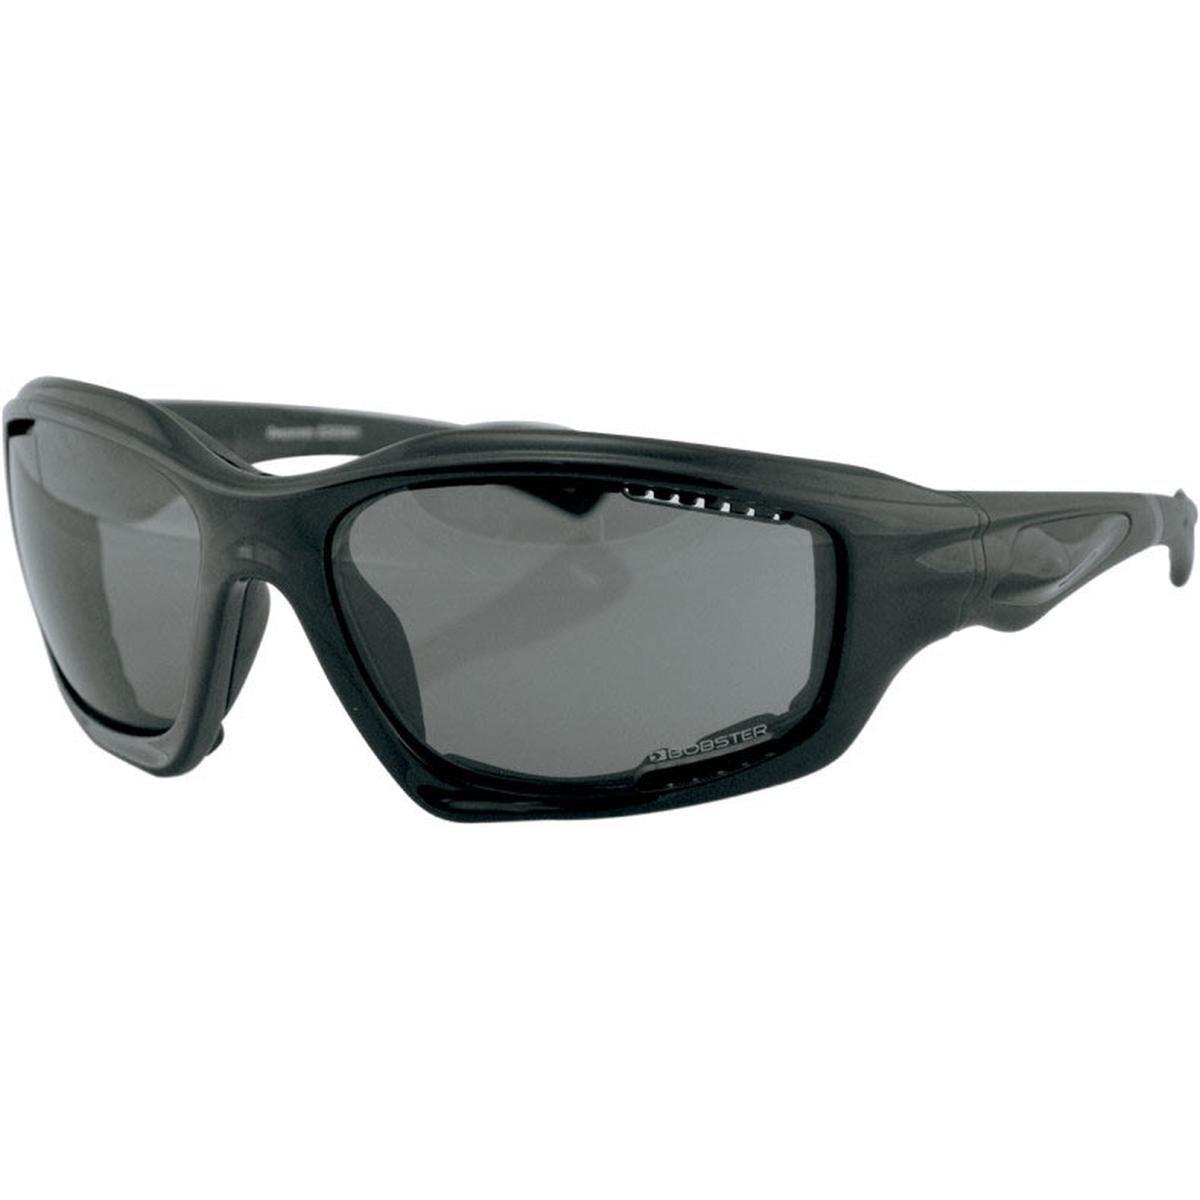 Bobster Desperado Adult Designer Motorcycle Sunglasses//Eyewear Black//Smoke//One Size Fits All